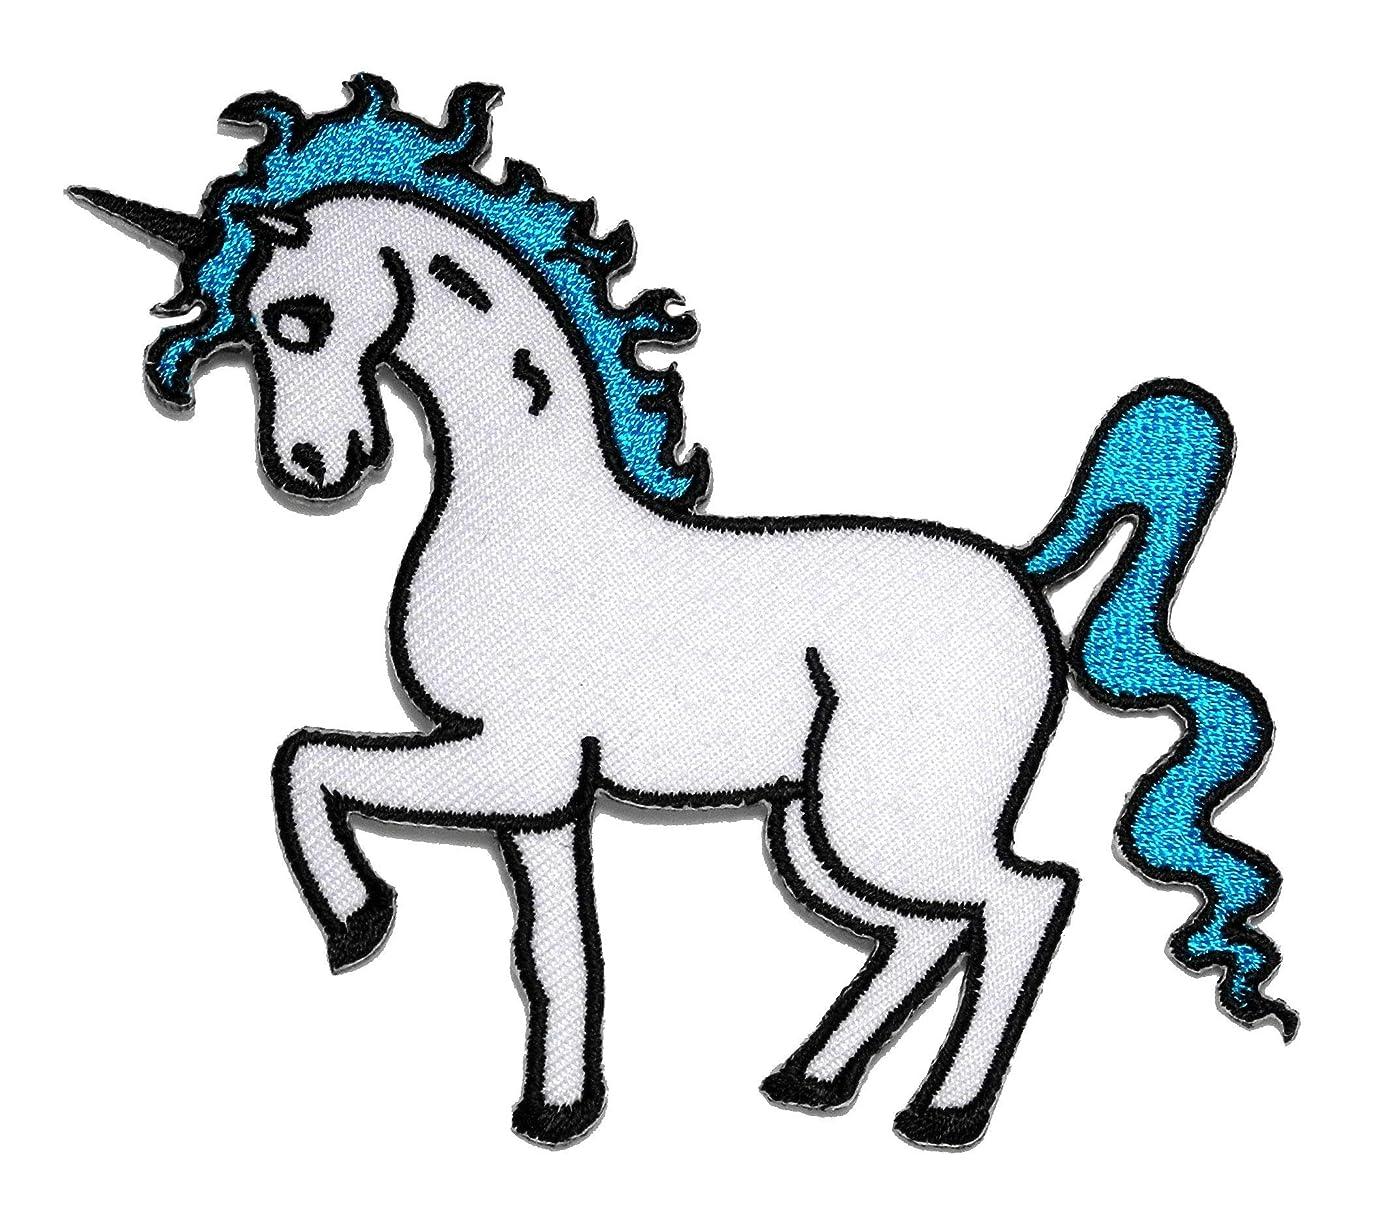 Blue Unicorn Cartoon DIY Applique Embroidered Sew Iron on Patch UNC-003